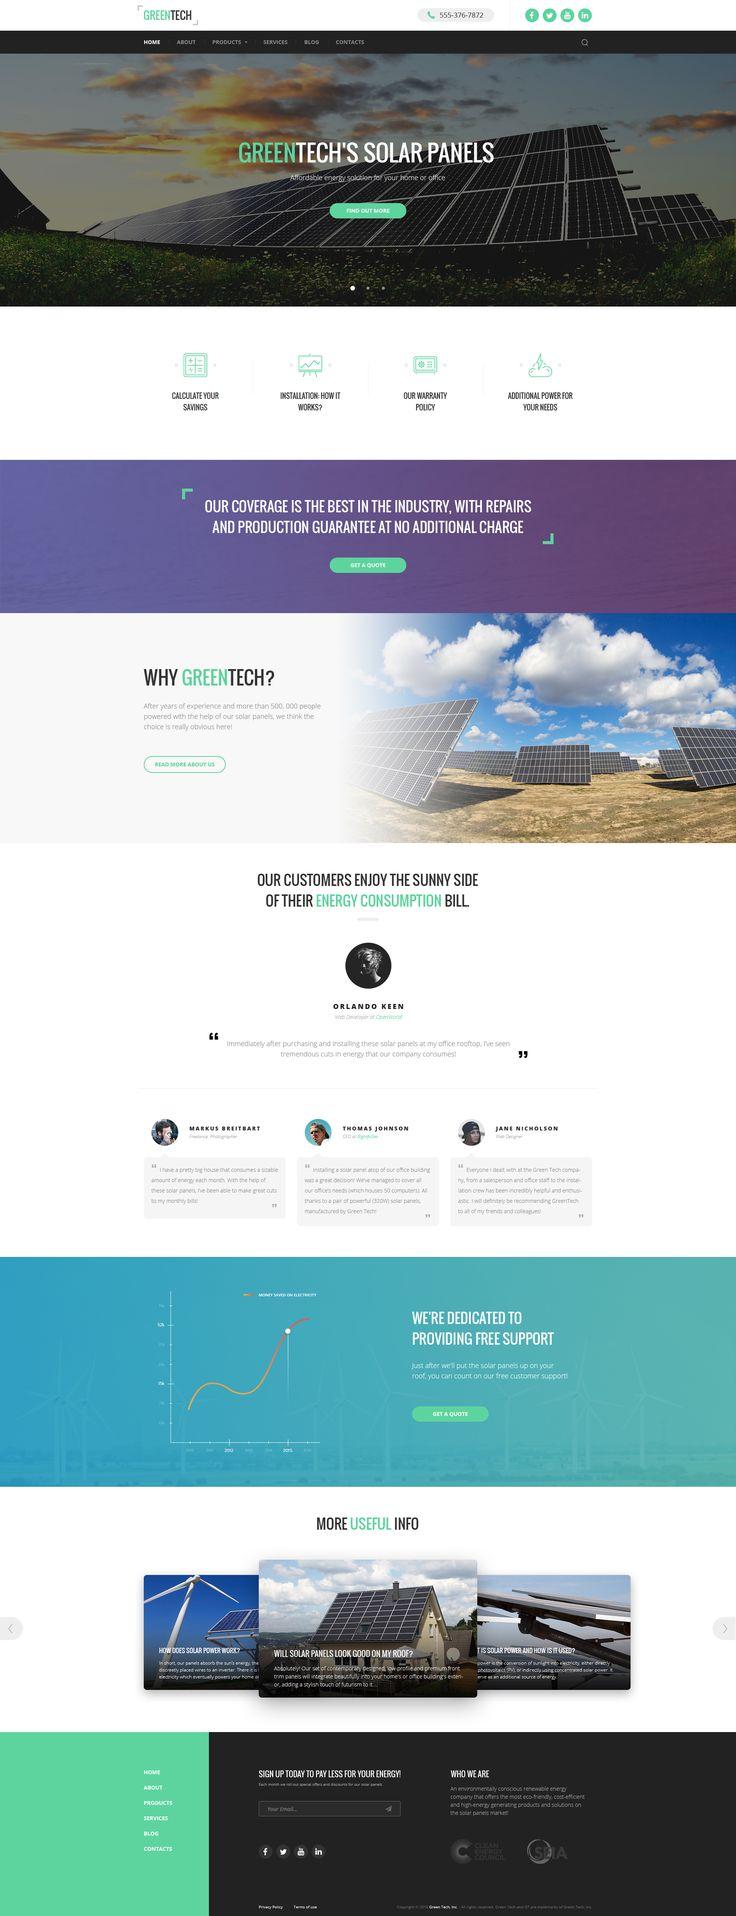 14 best Alternative Power Web Templates images on Pinterest | Design ...